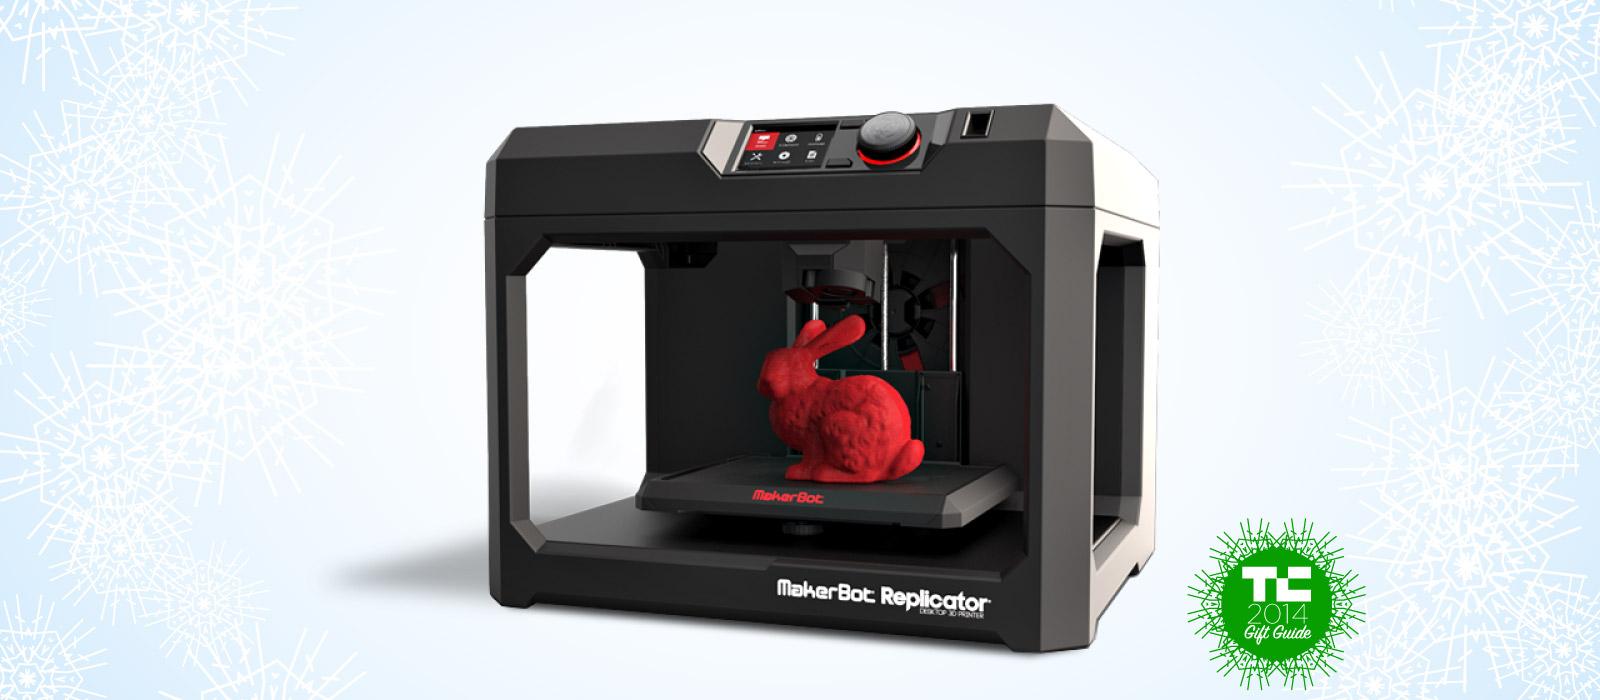 makerbot-giftguide14